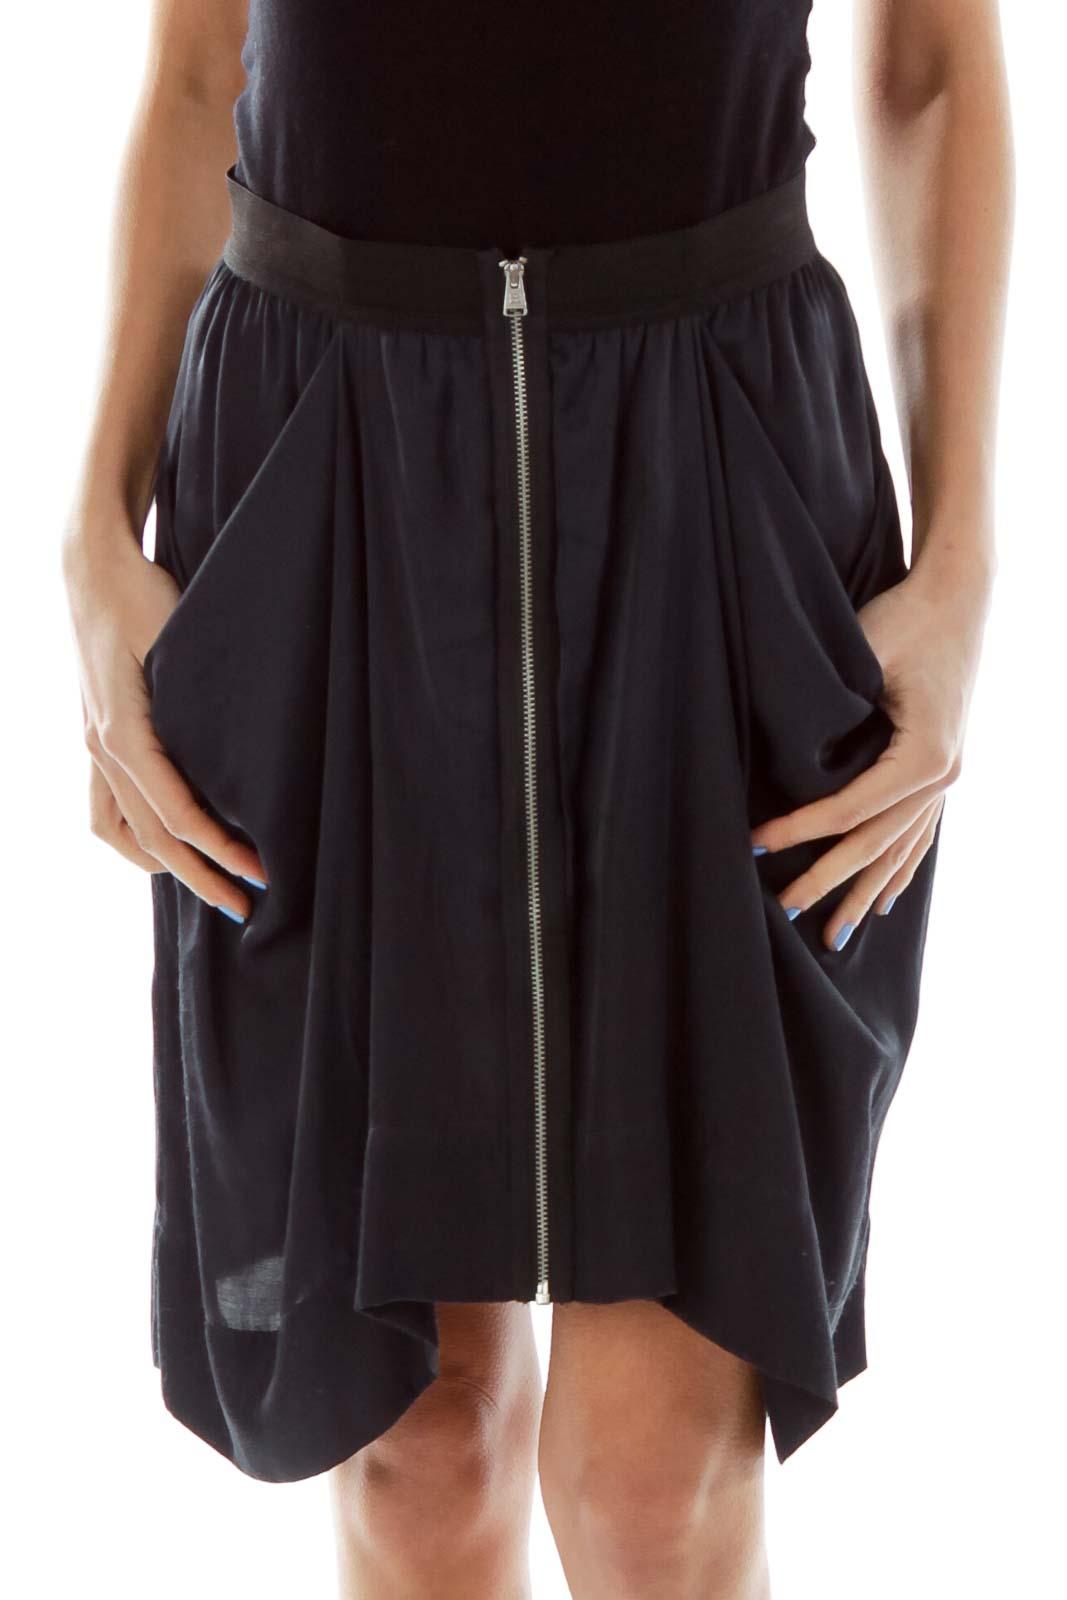 Black Pocketed Skirt Front